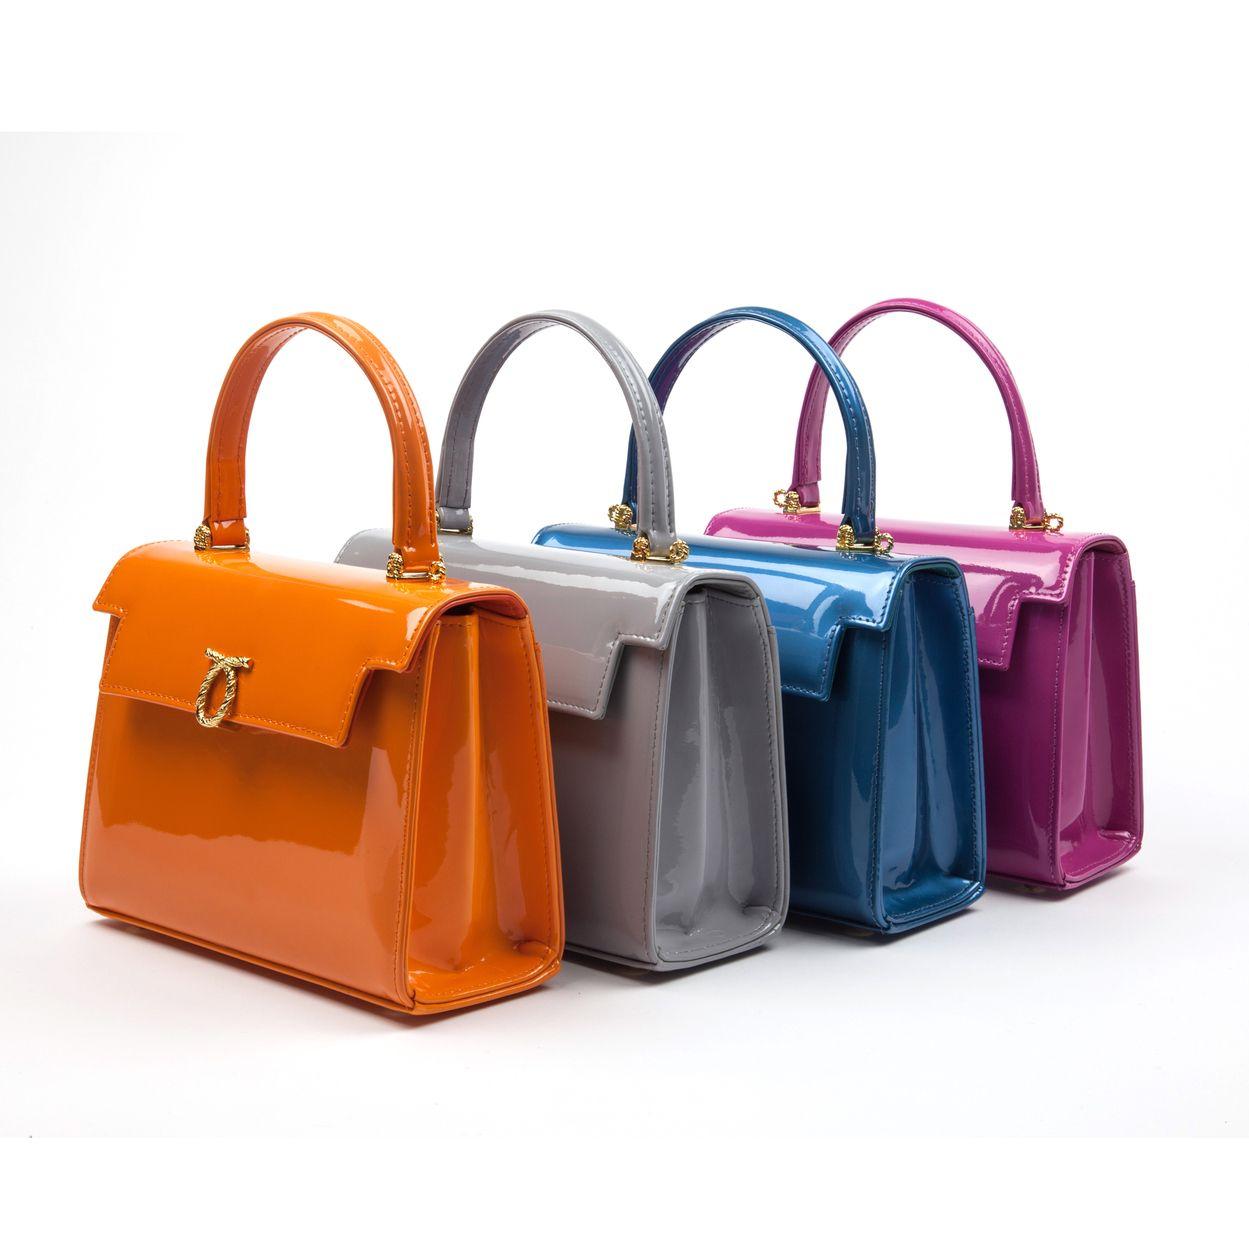 6aa7204e5c Launer London Judi Patent Handbag Collection £1